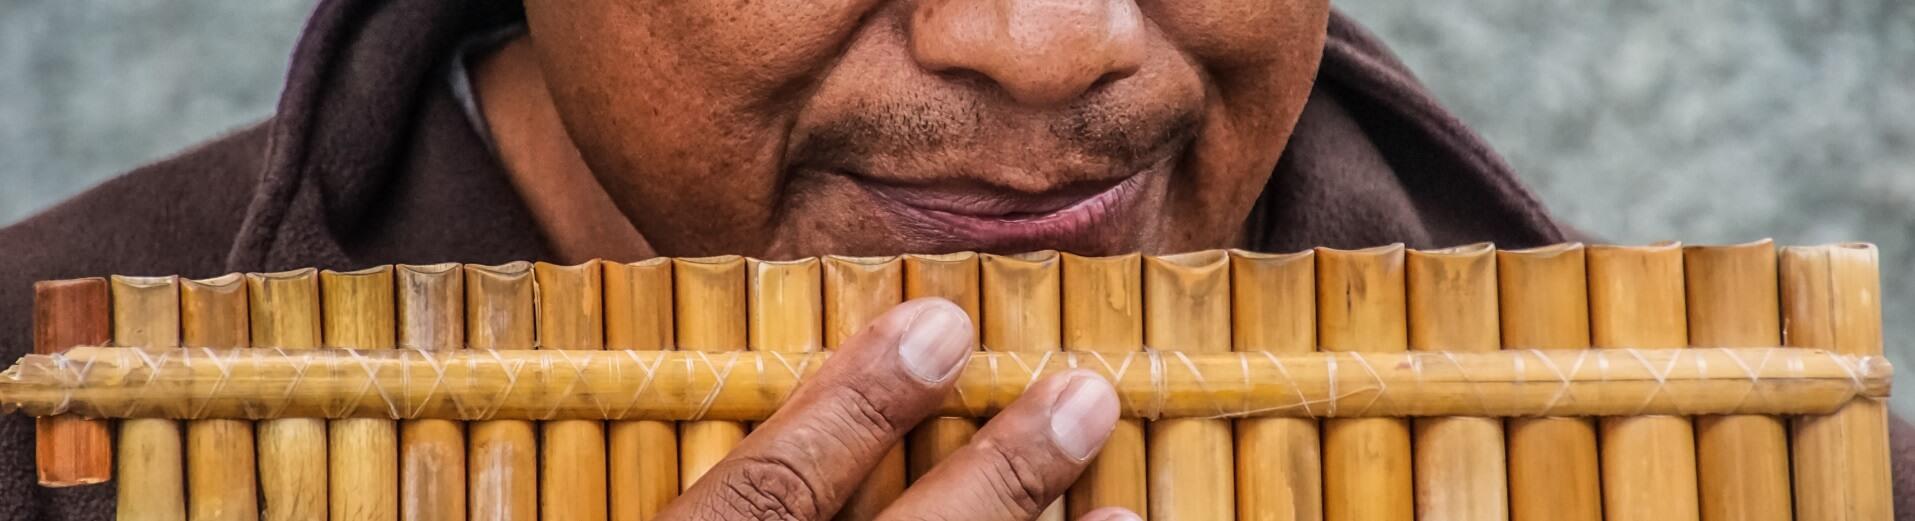 Bambus Instrumente, Percussion, Blasinstrumente aus Bambus